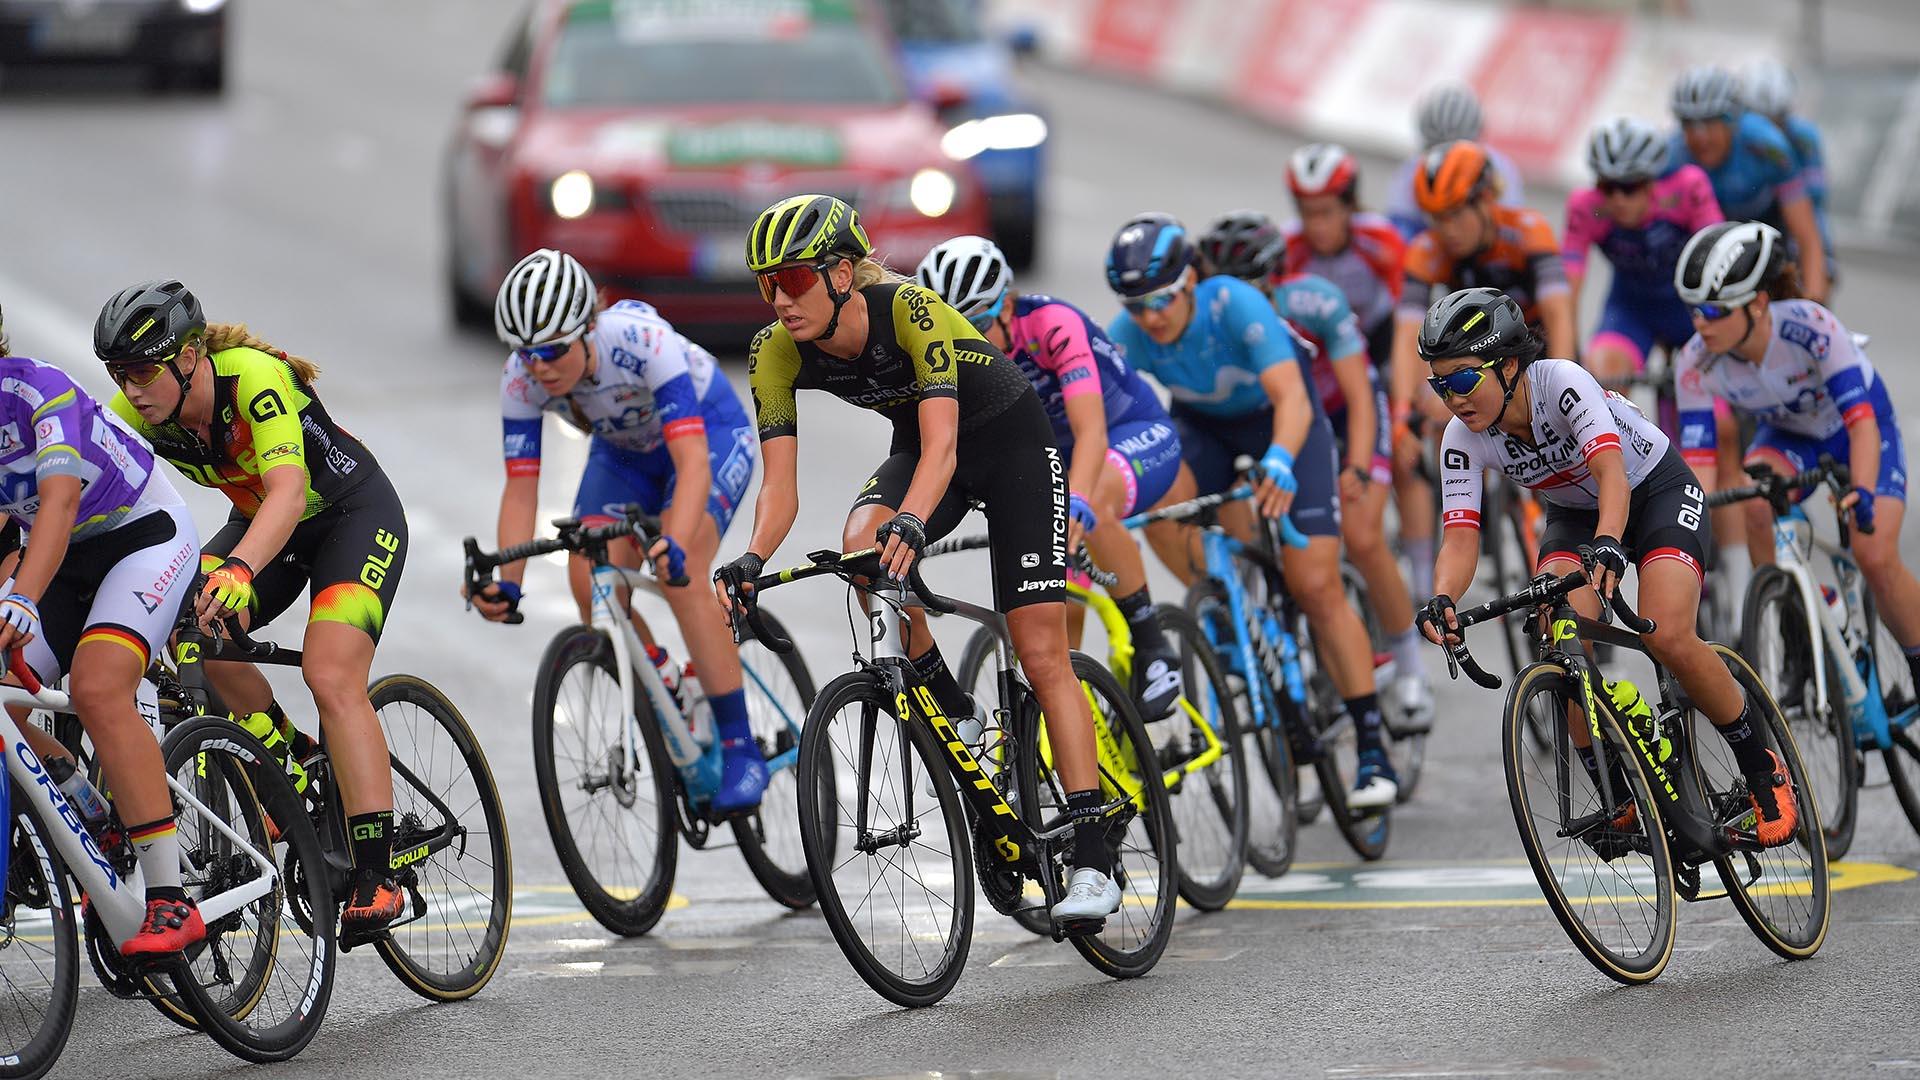 Chloe Hosking wins Stage 2 at 2019 Madrid Challenge